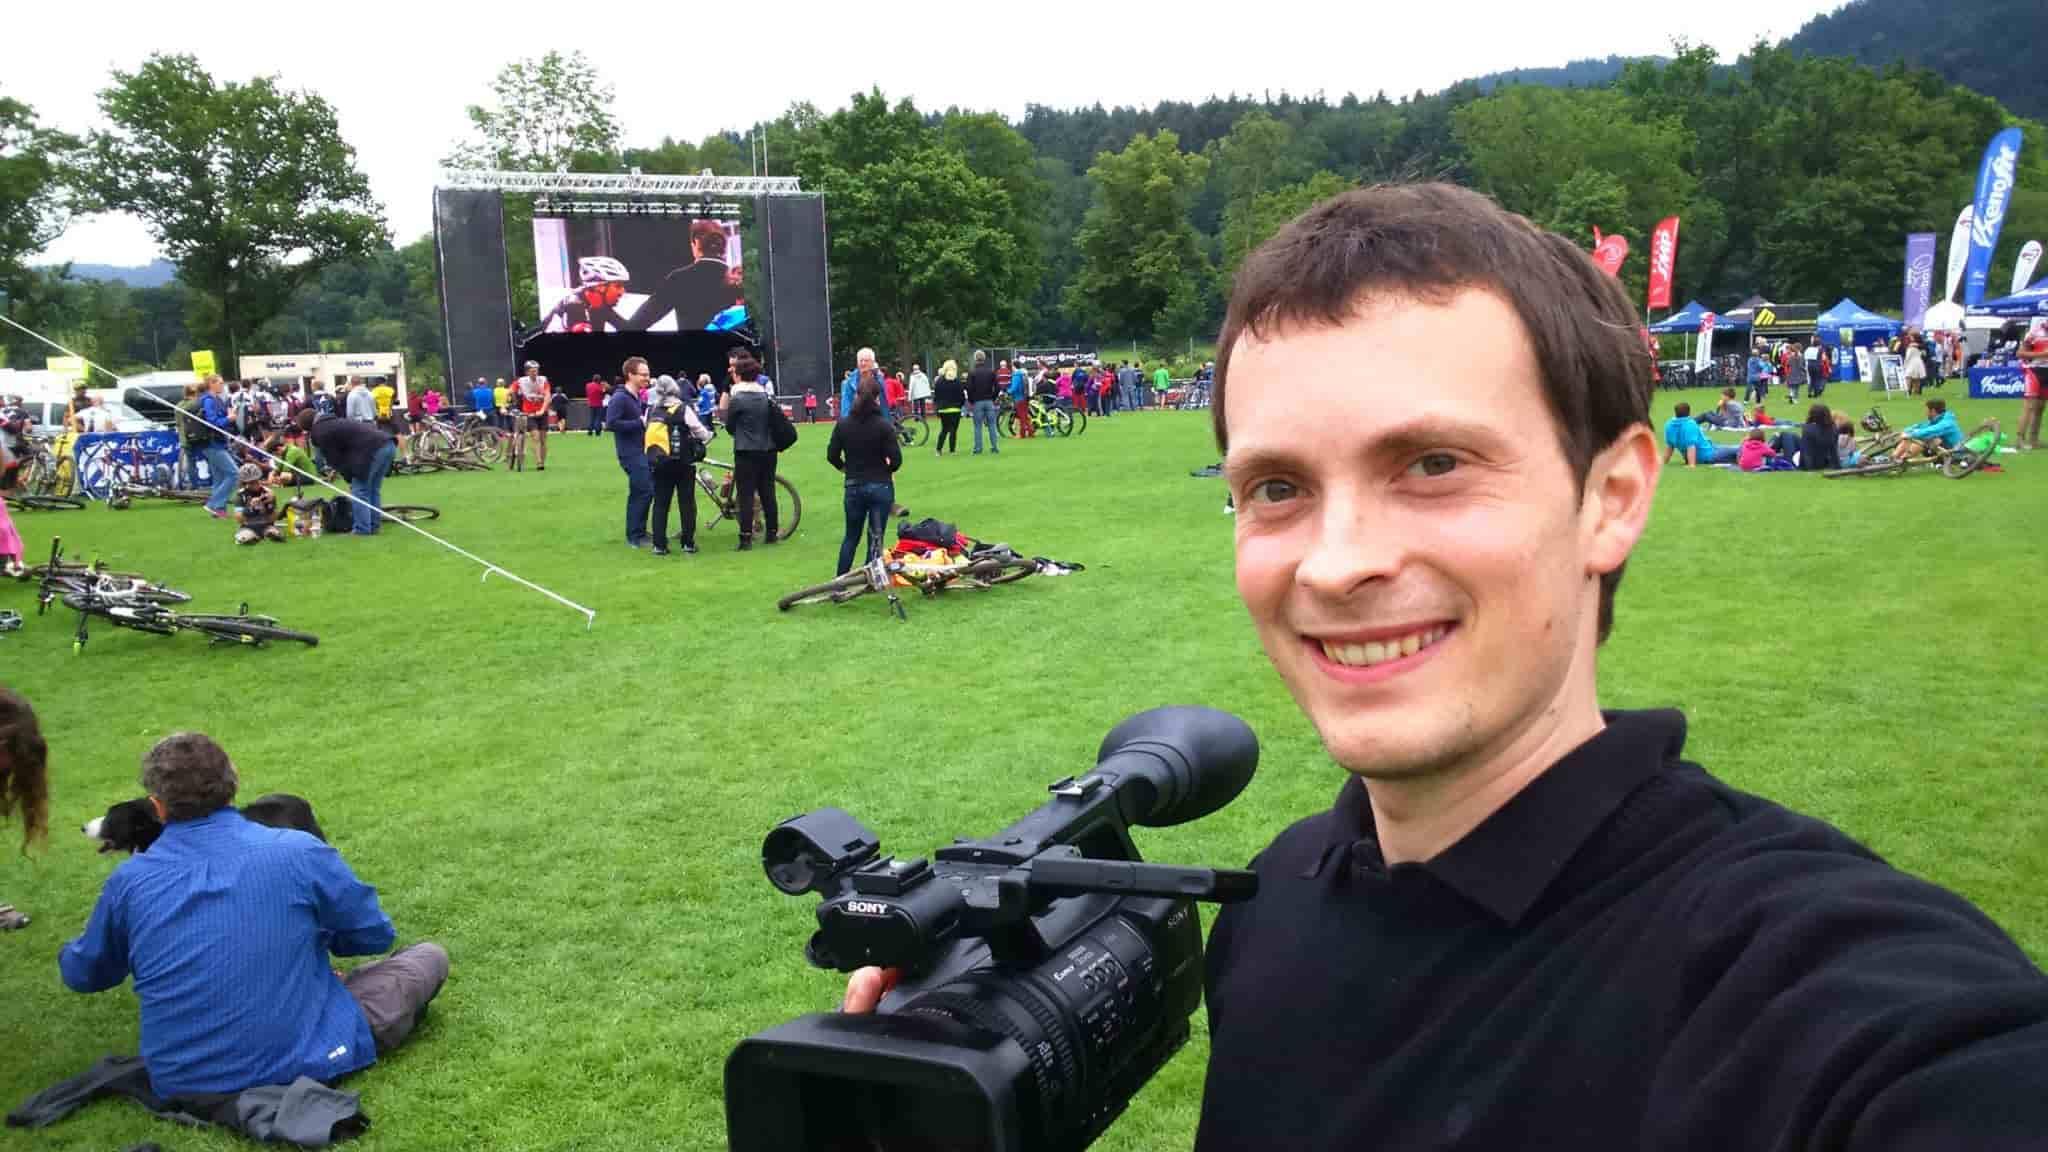 videowand-kirchzarten-bfub-mountainbike